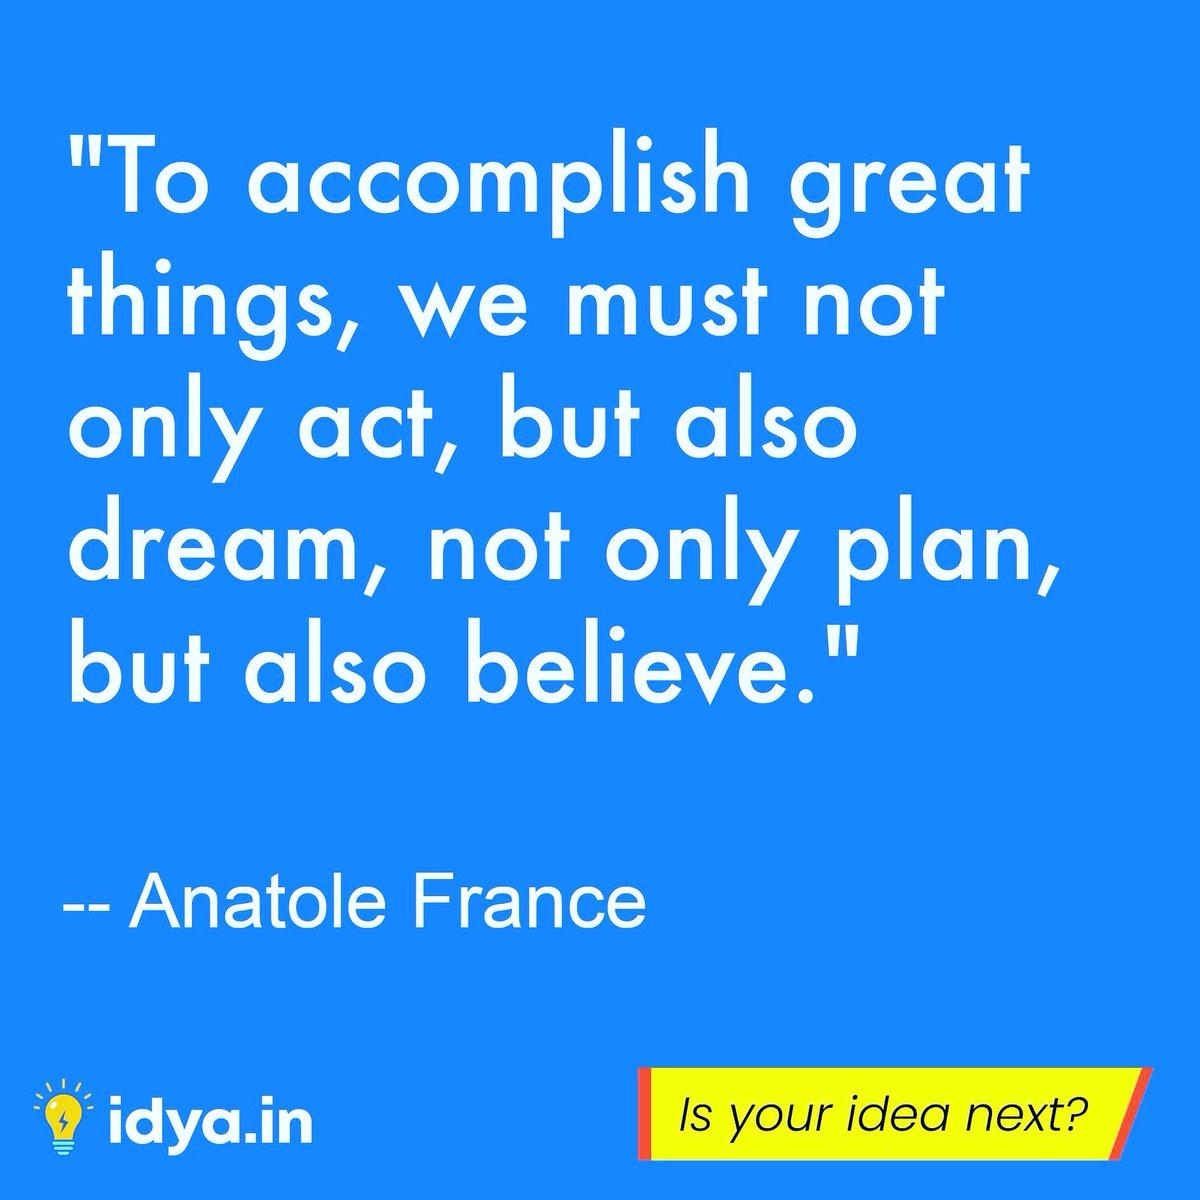 Do you believe in your dreams? Signup for Beta launch http://idya.in #idea #newideas #innovativeideas #innovation #entreprenurship #sayourideas #founders #startups #entrepreneurs #startupfunding #vcfunding #startupideas #angelinvesting #believe #dreams #inventorspic.twitter.com/CPwx4Vy0MH